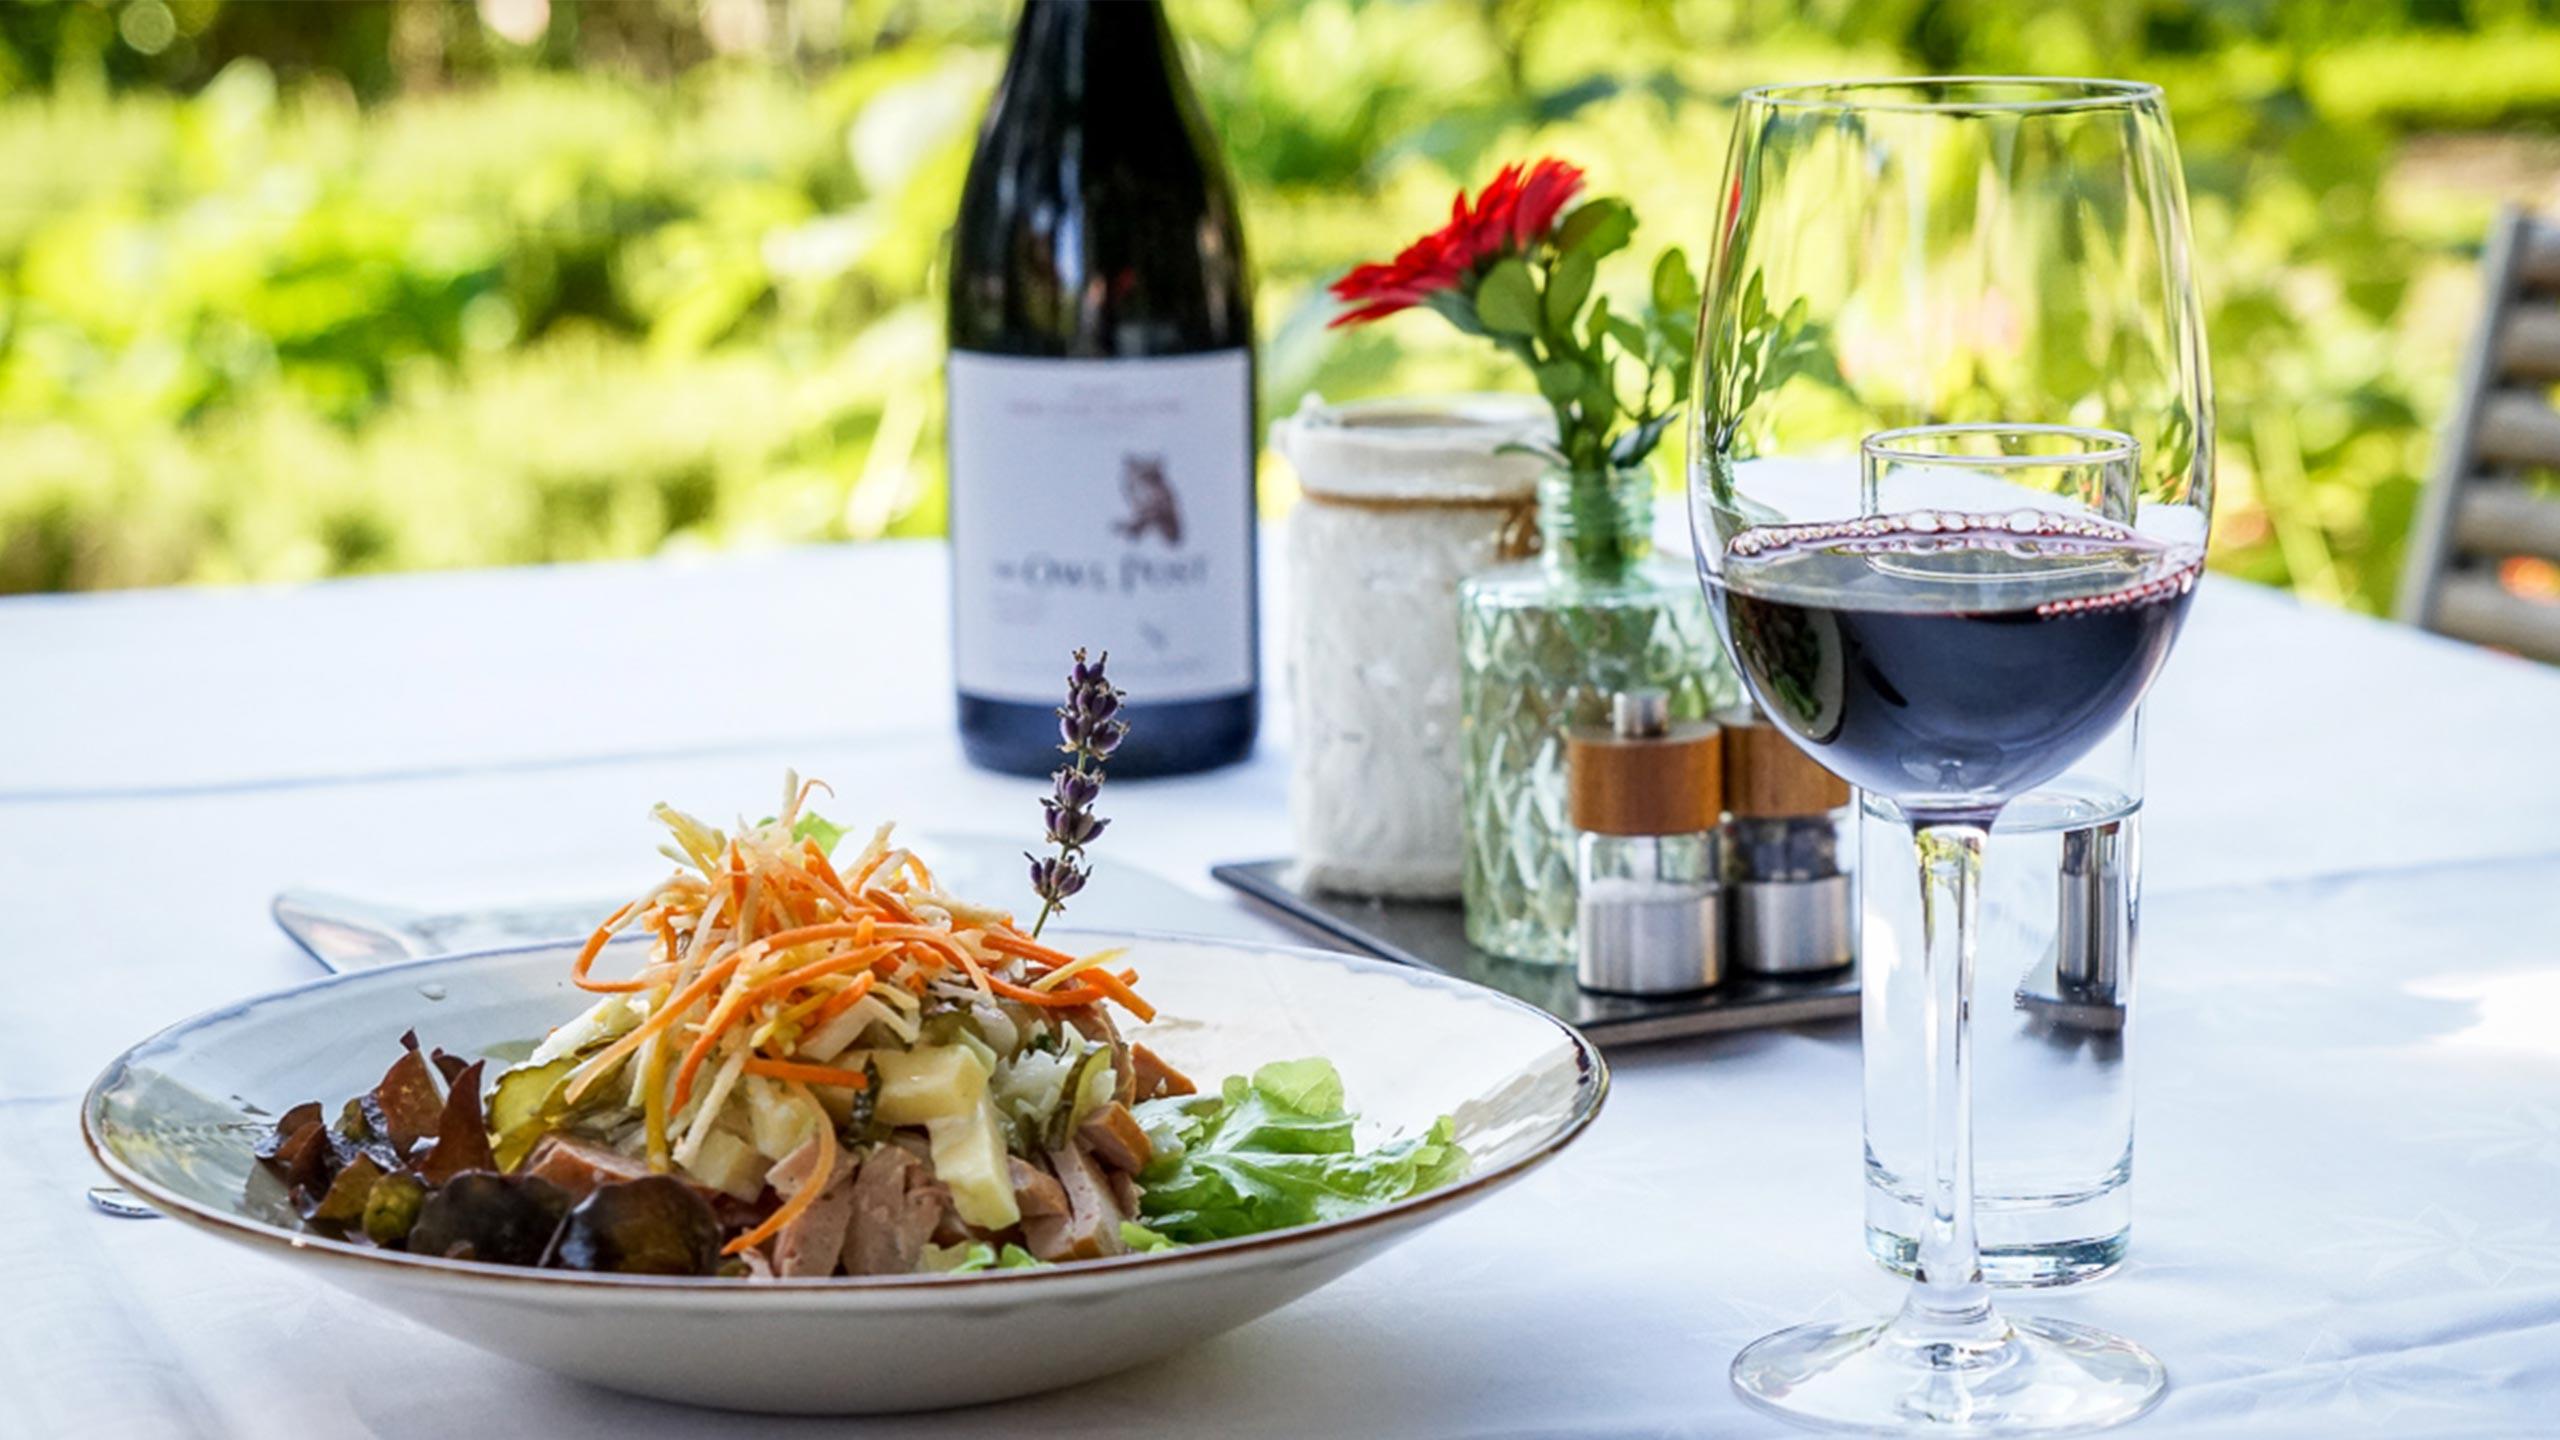 edelweiss-restaurant-wilderswil-wurst-kaese-salat-wein.jpg